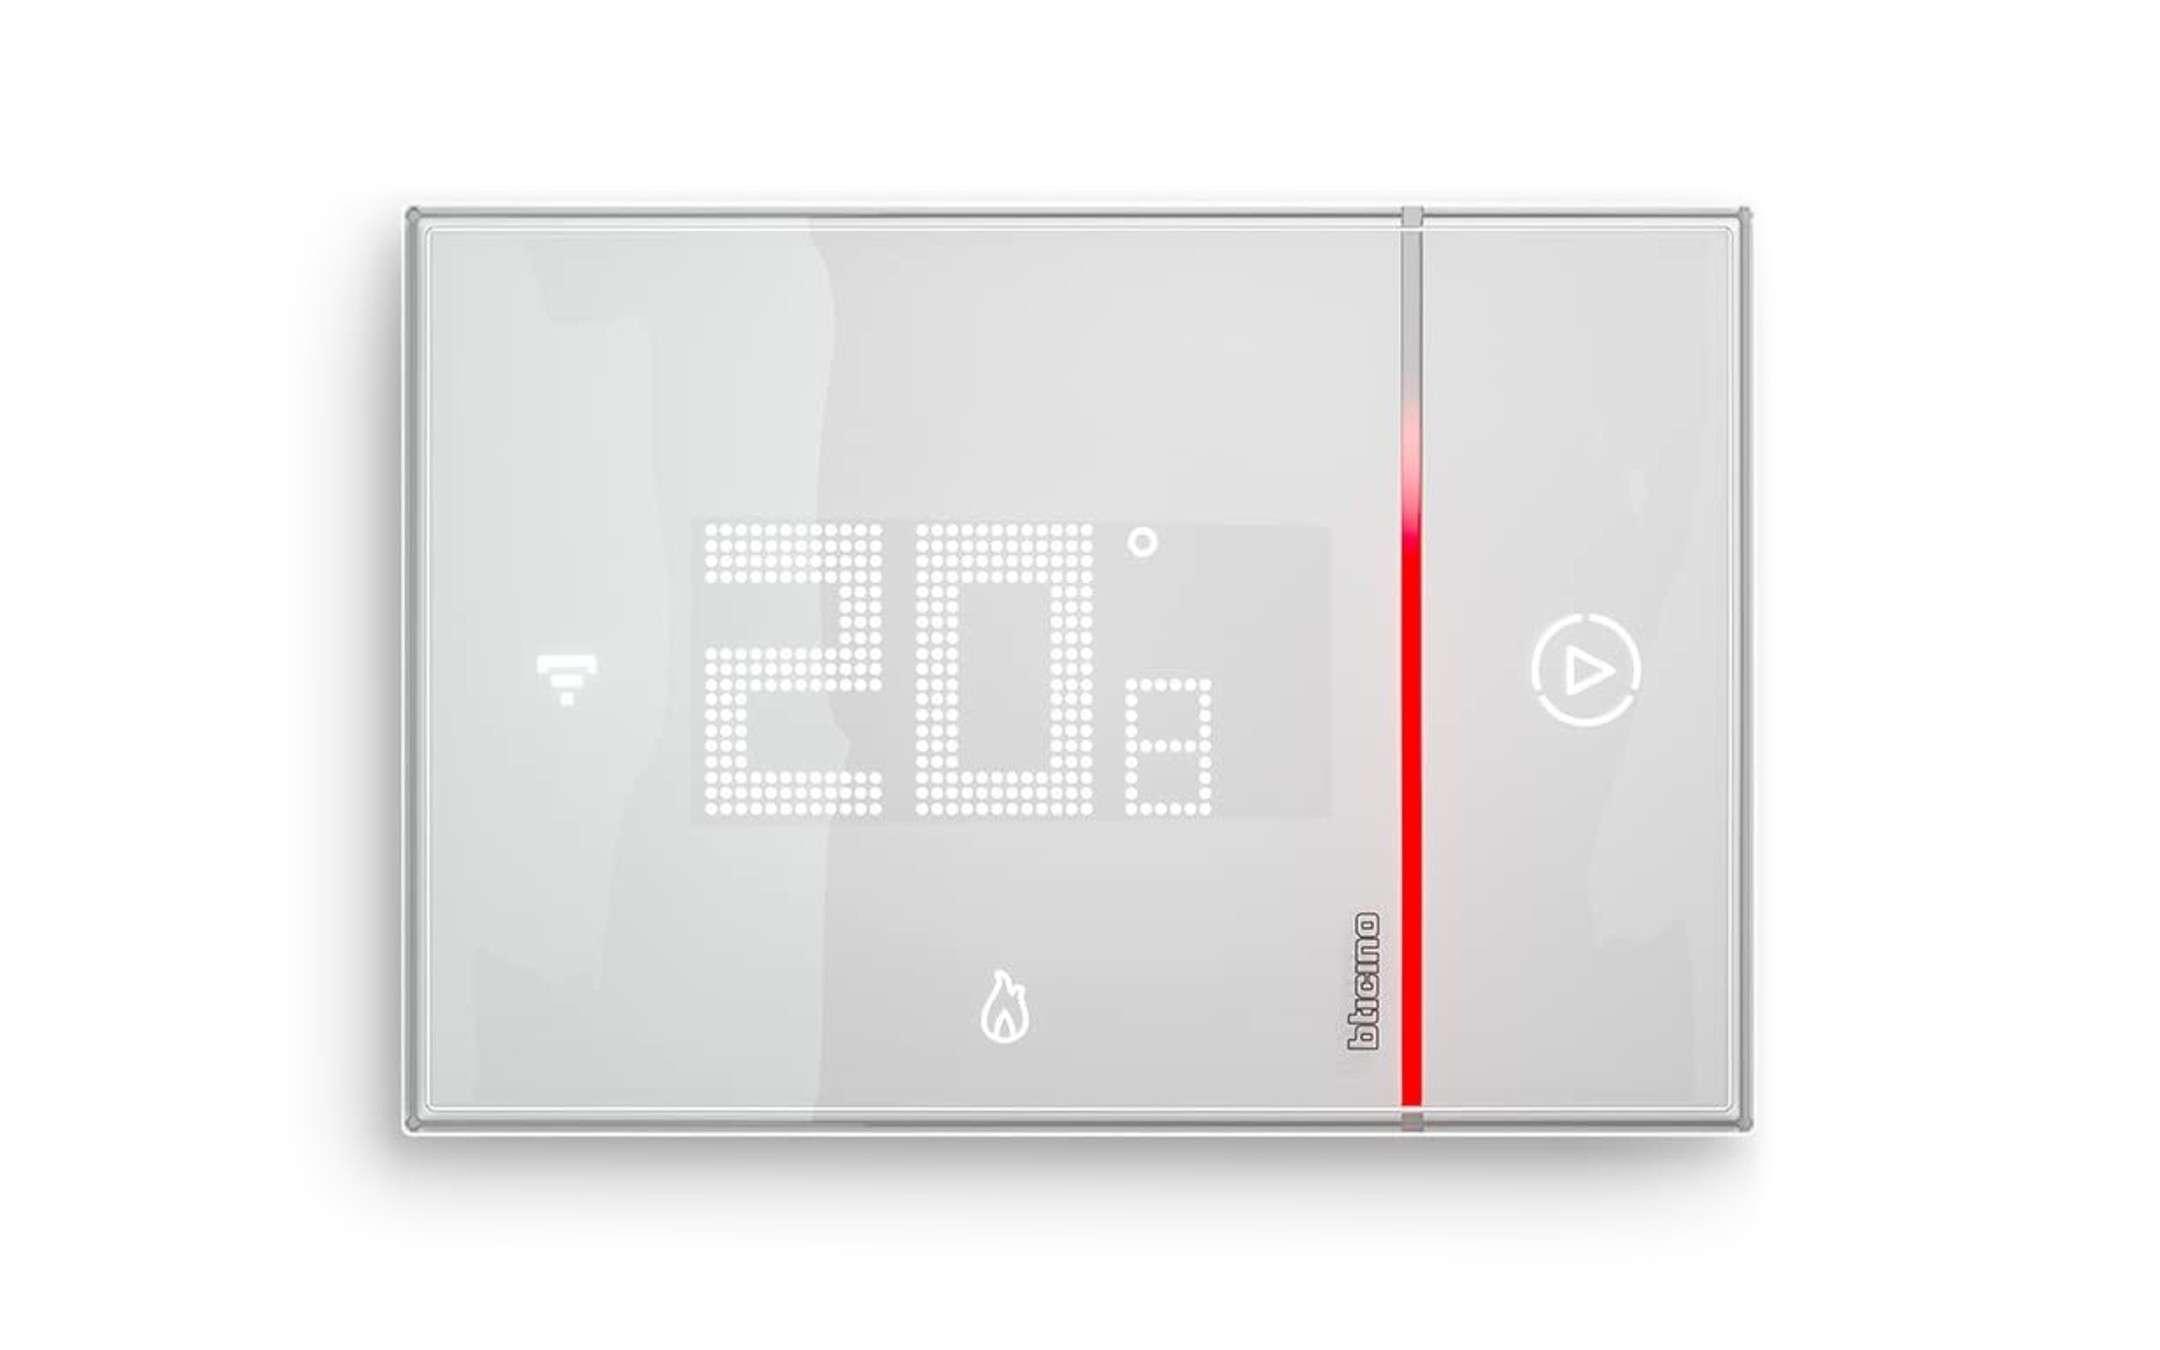 Bticino SX8000: super discount for the smart thermostat